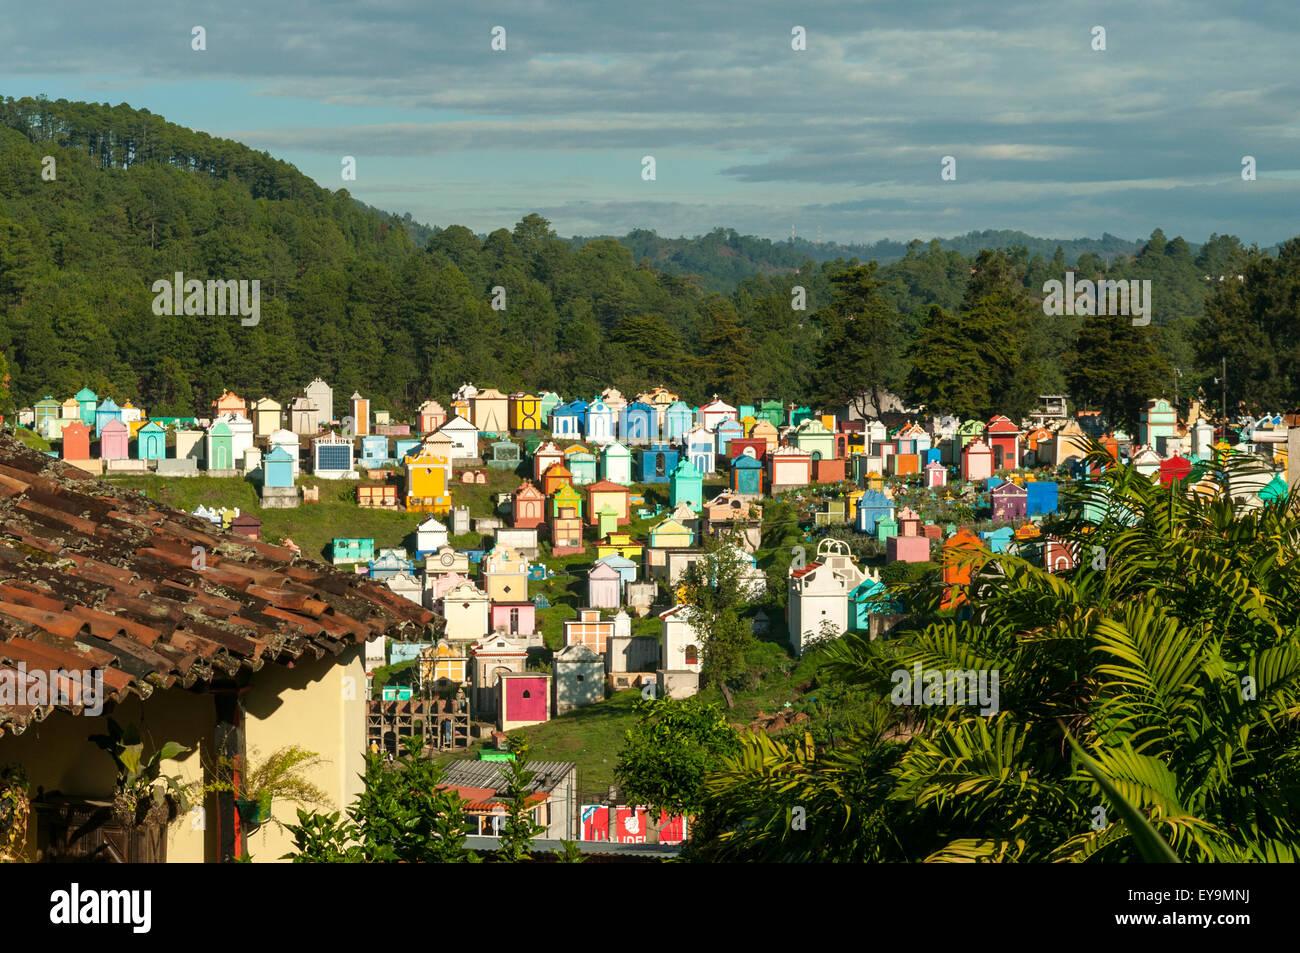 The Cemetery, Chichicastenango, Guatemala - Stock Image